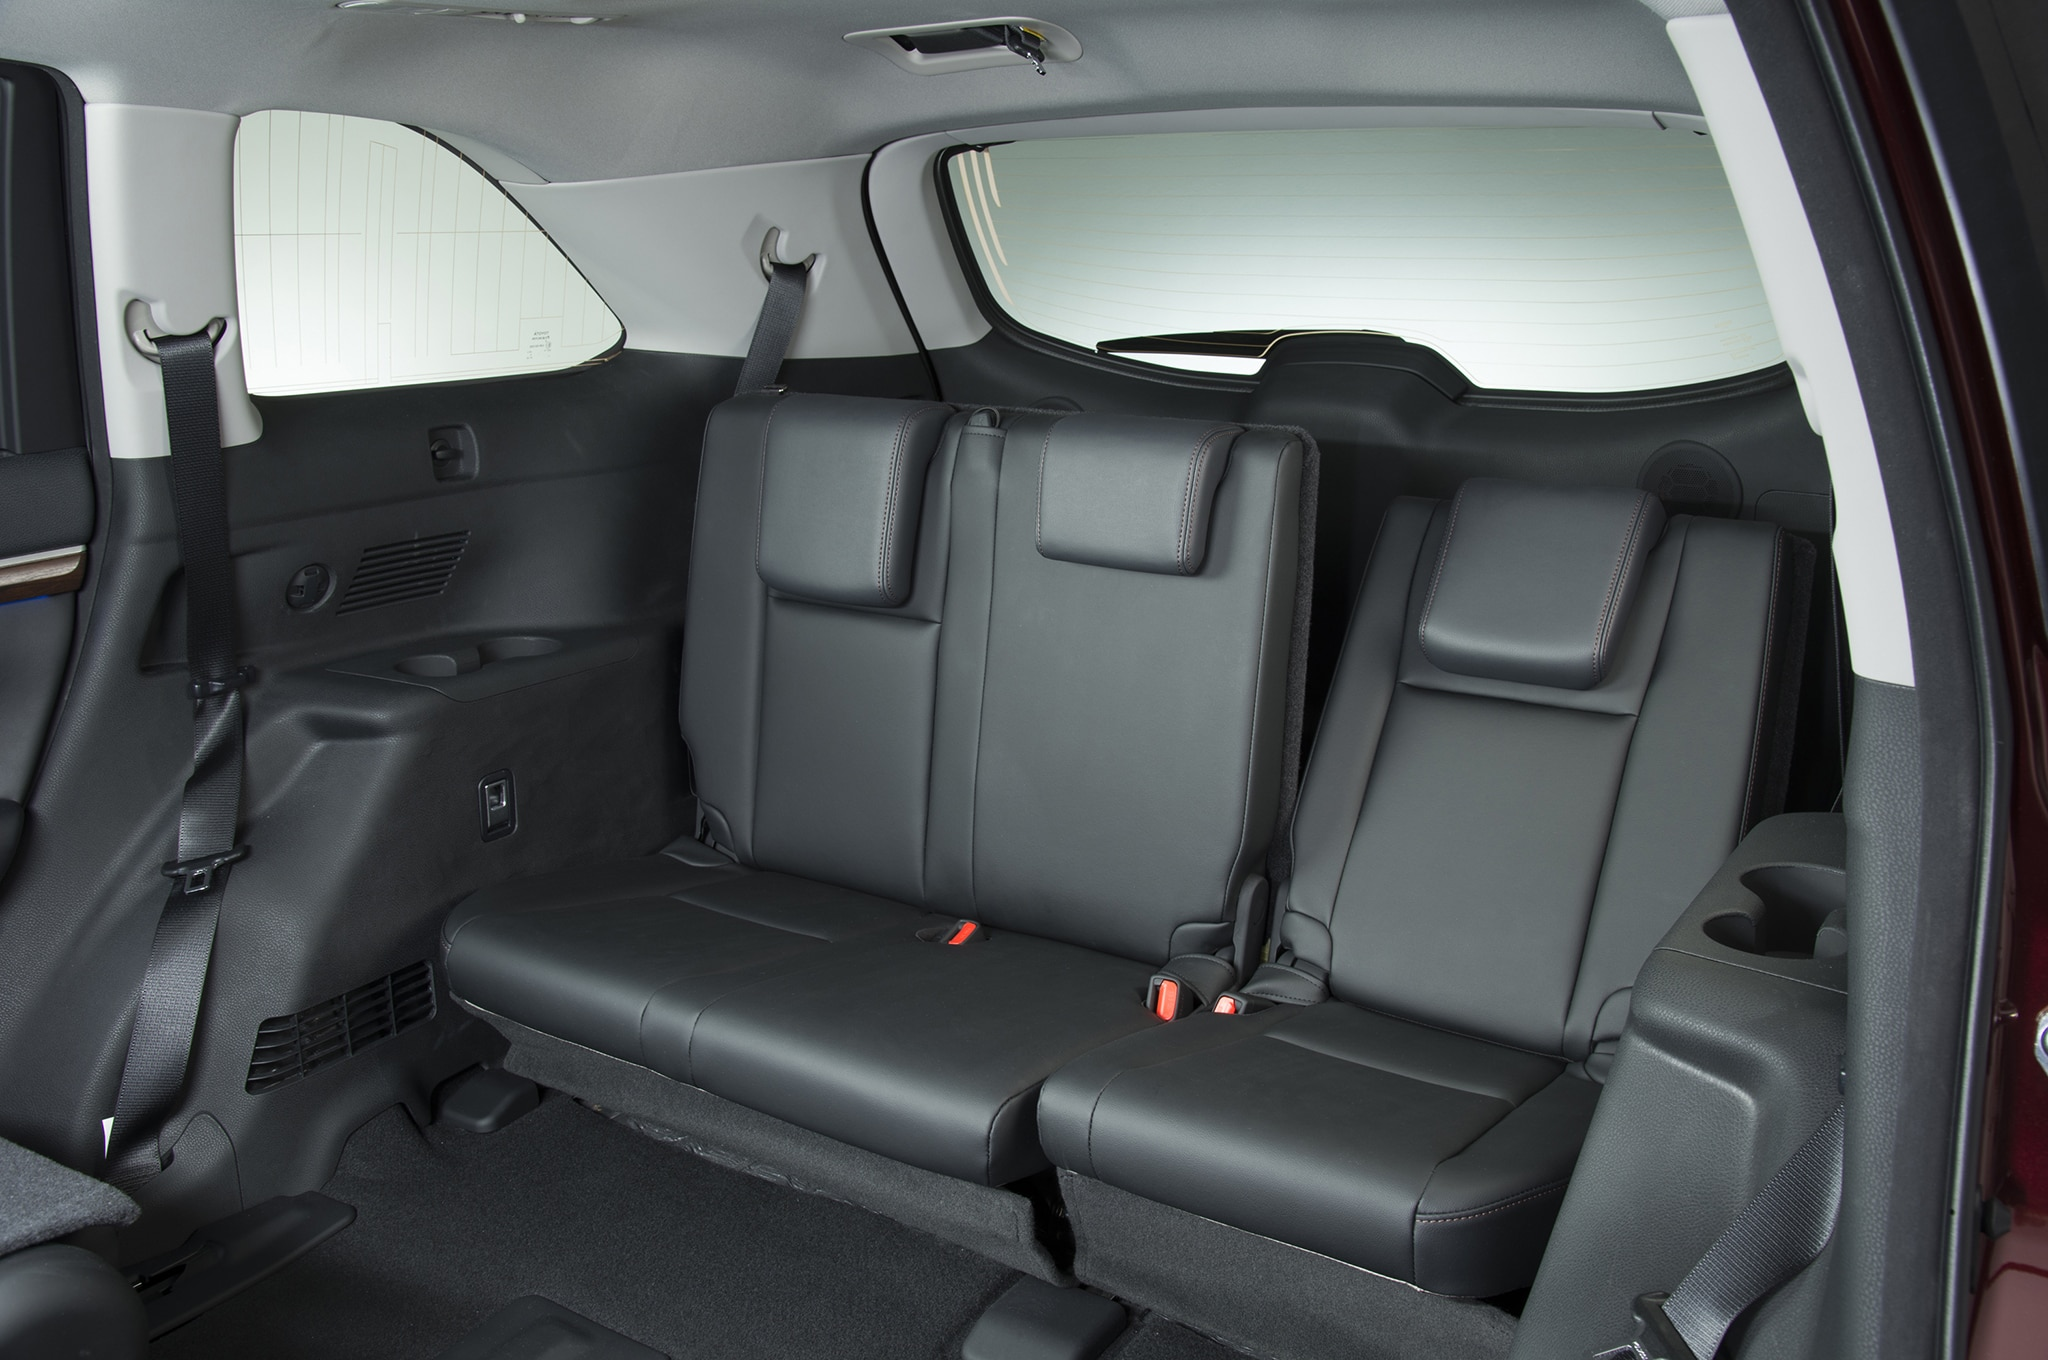 Toyota Highlander Seating >> 2014 Toyota Highlander Review Automobile Magazine